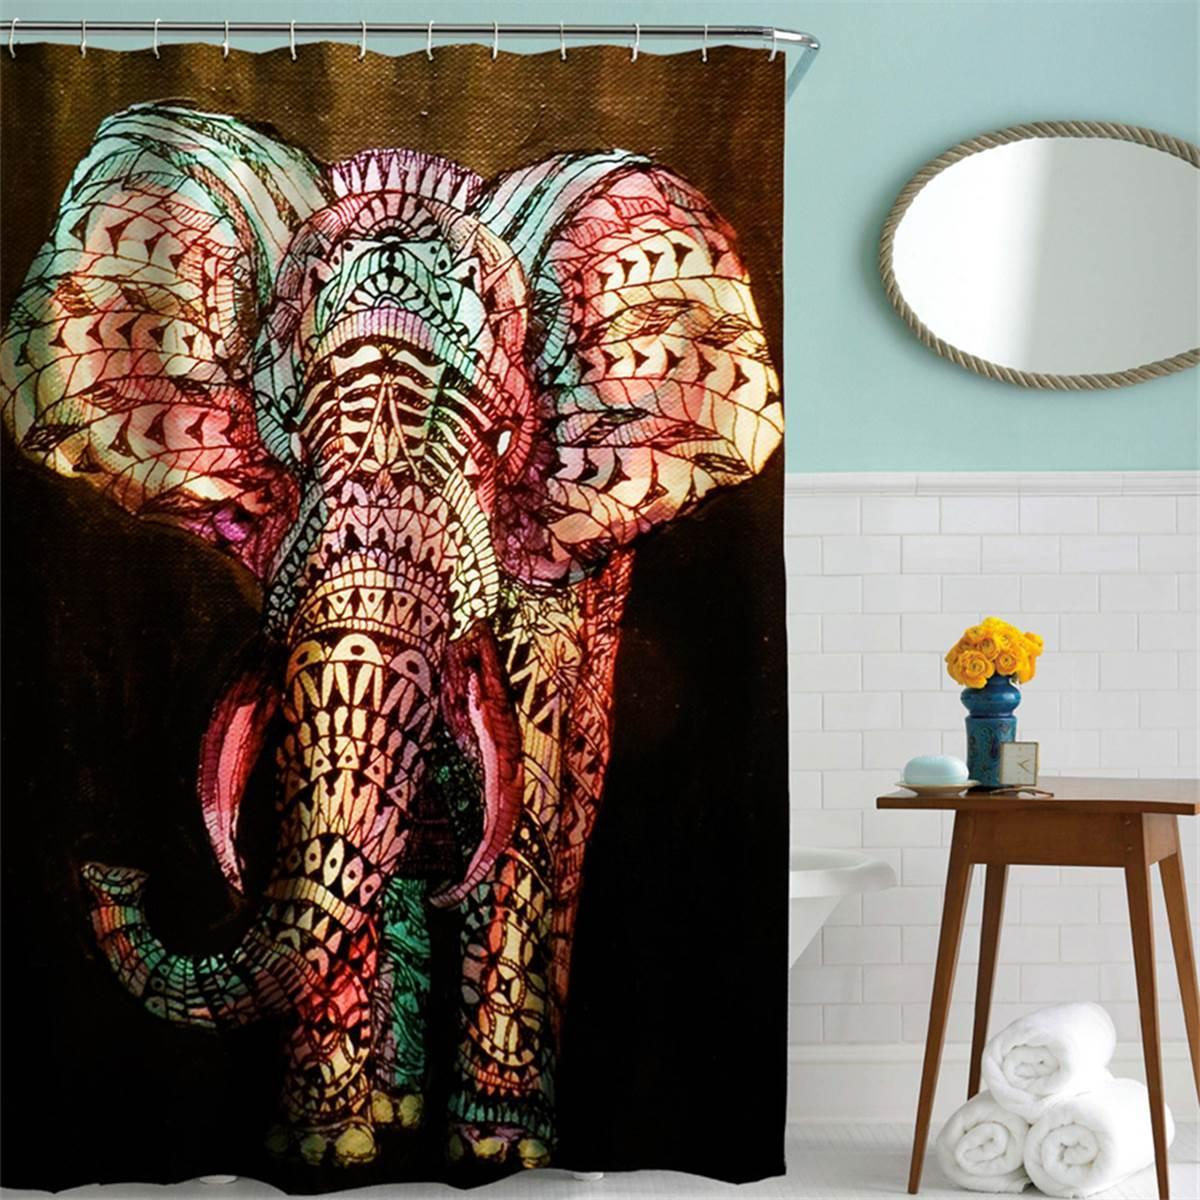 2019 180x180cm Polyester Elephant Shower Curtain Hooks Set Shower Panel Sheer Cover Home Bathroom Screen Decorative Accessories From Kepi4 35 82